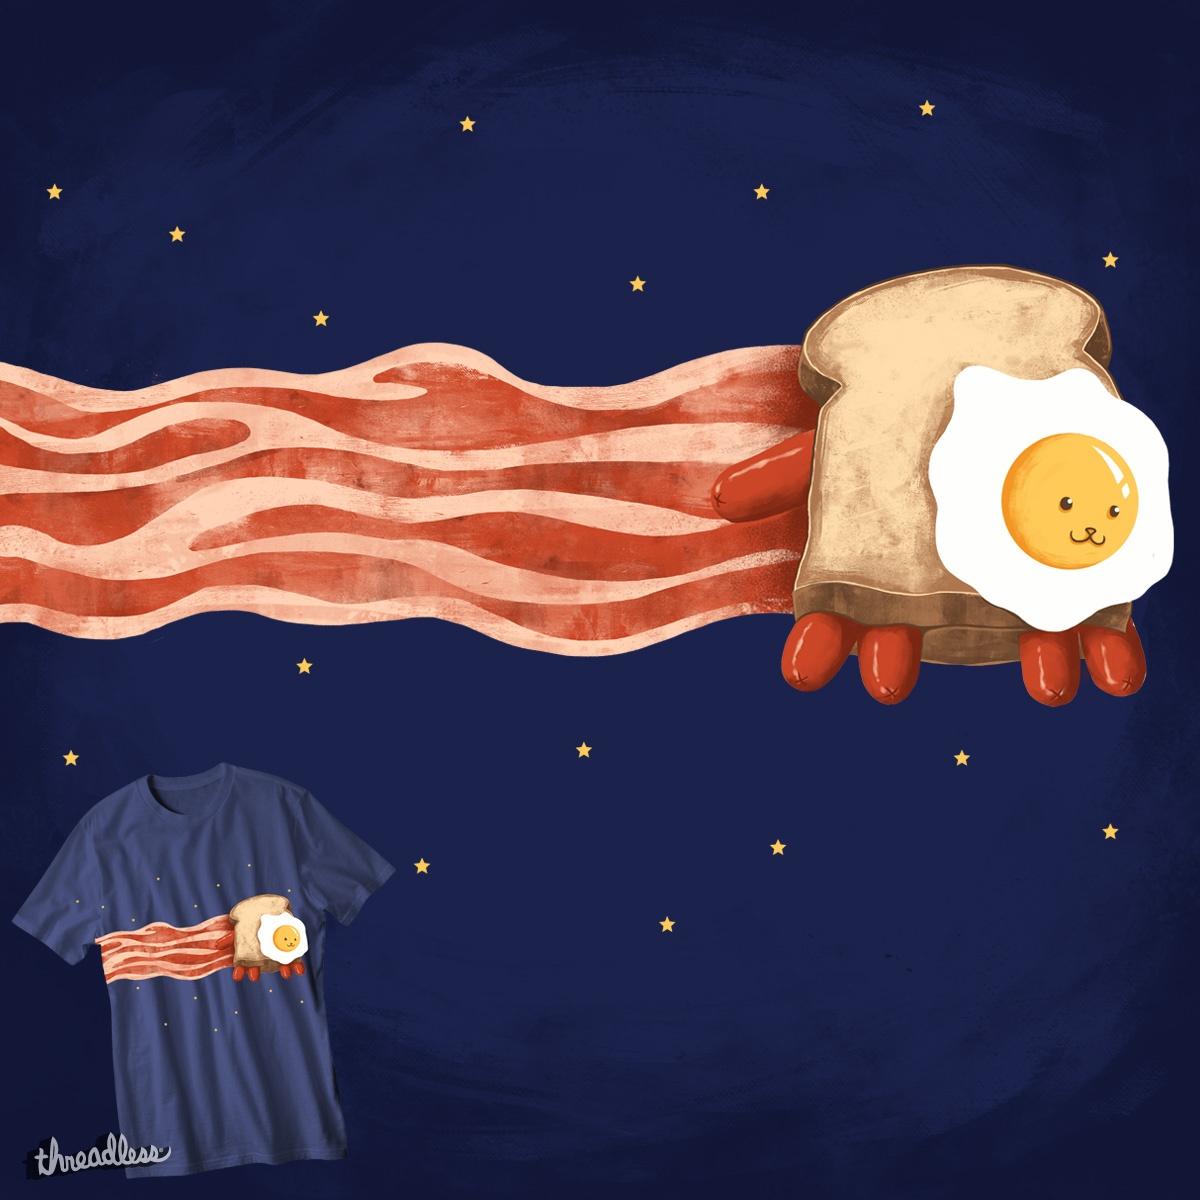 nyan bacon by zakiihamdanii on Threadless